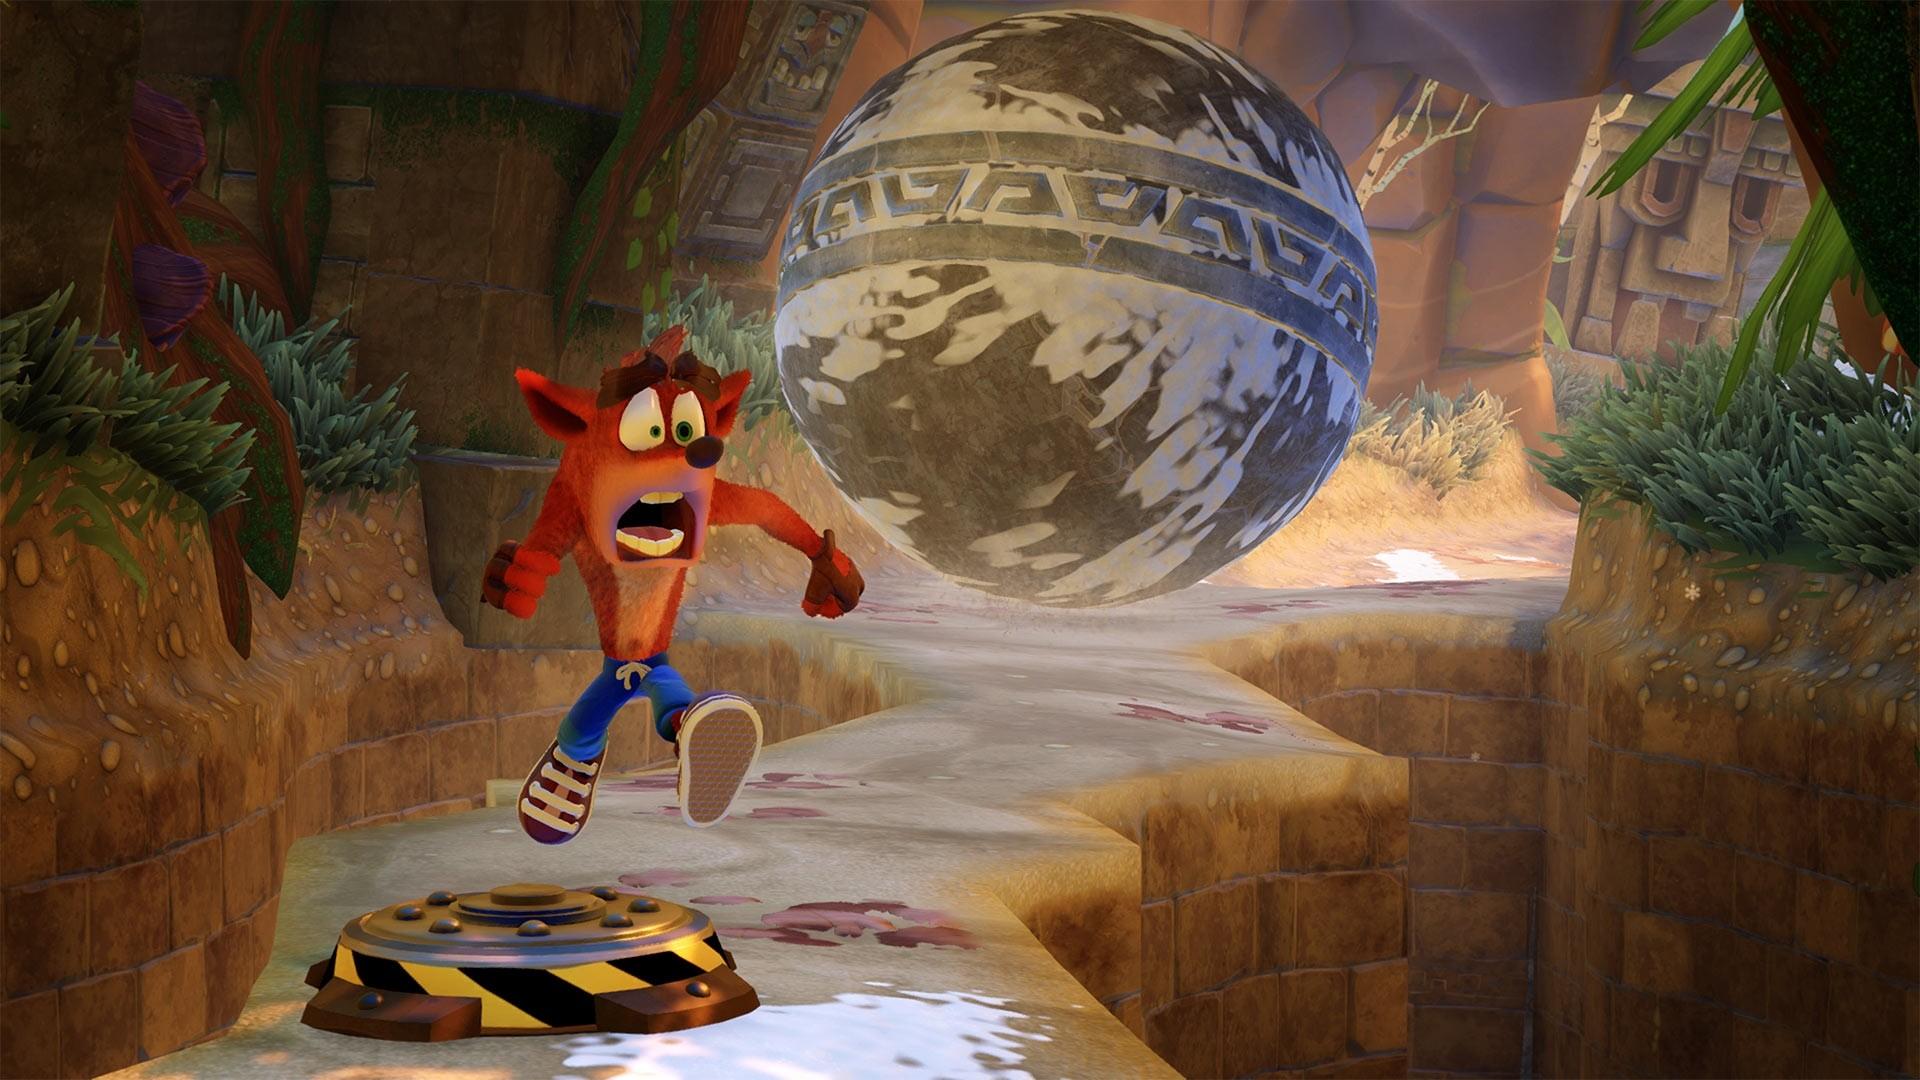 Crash Bandicoot Background Wallpaper